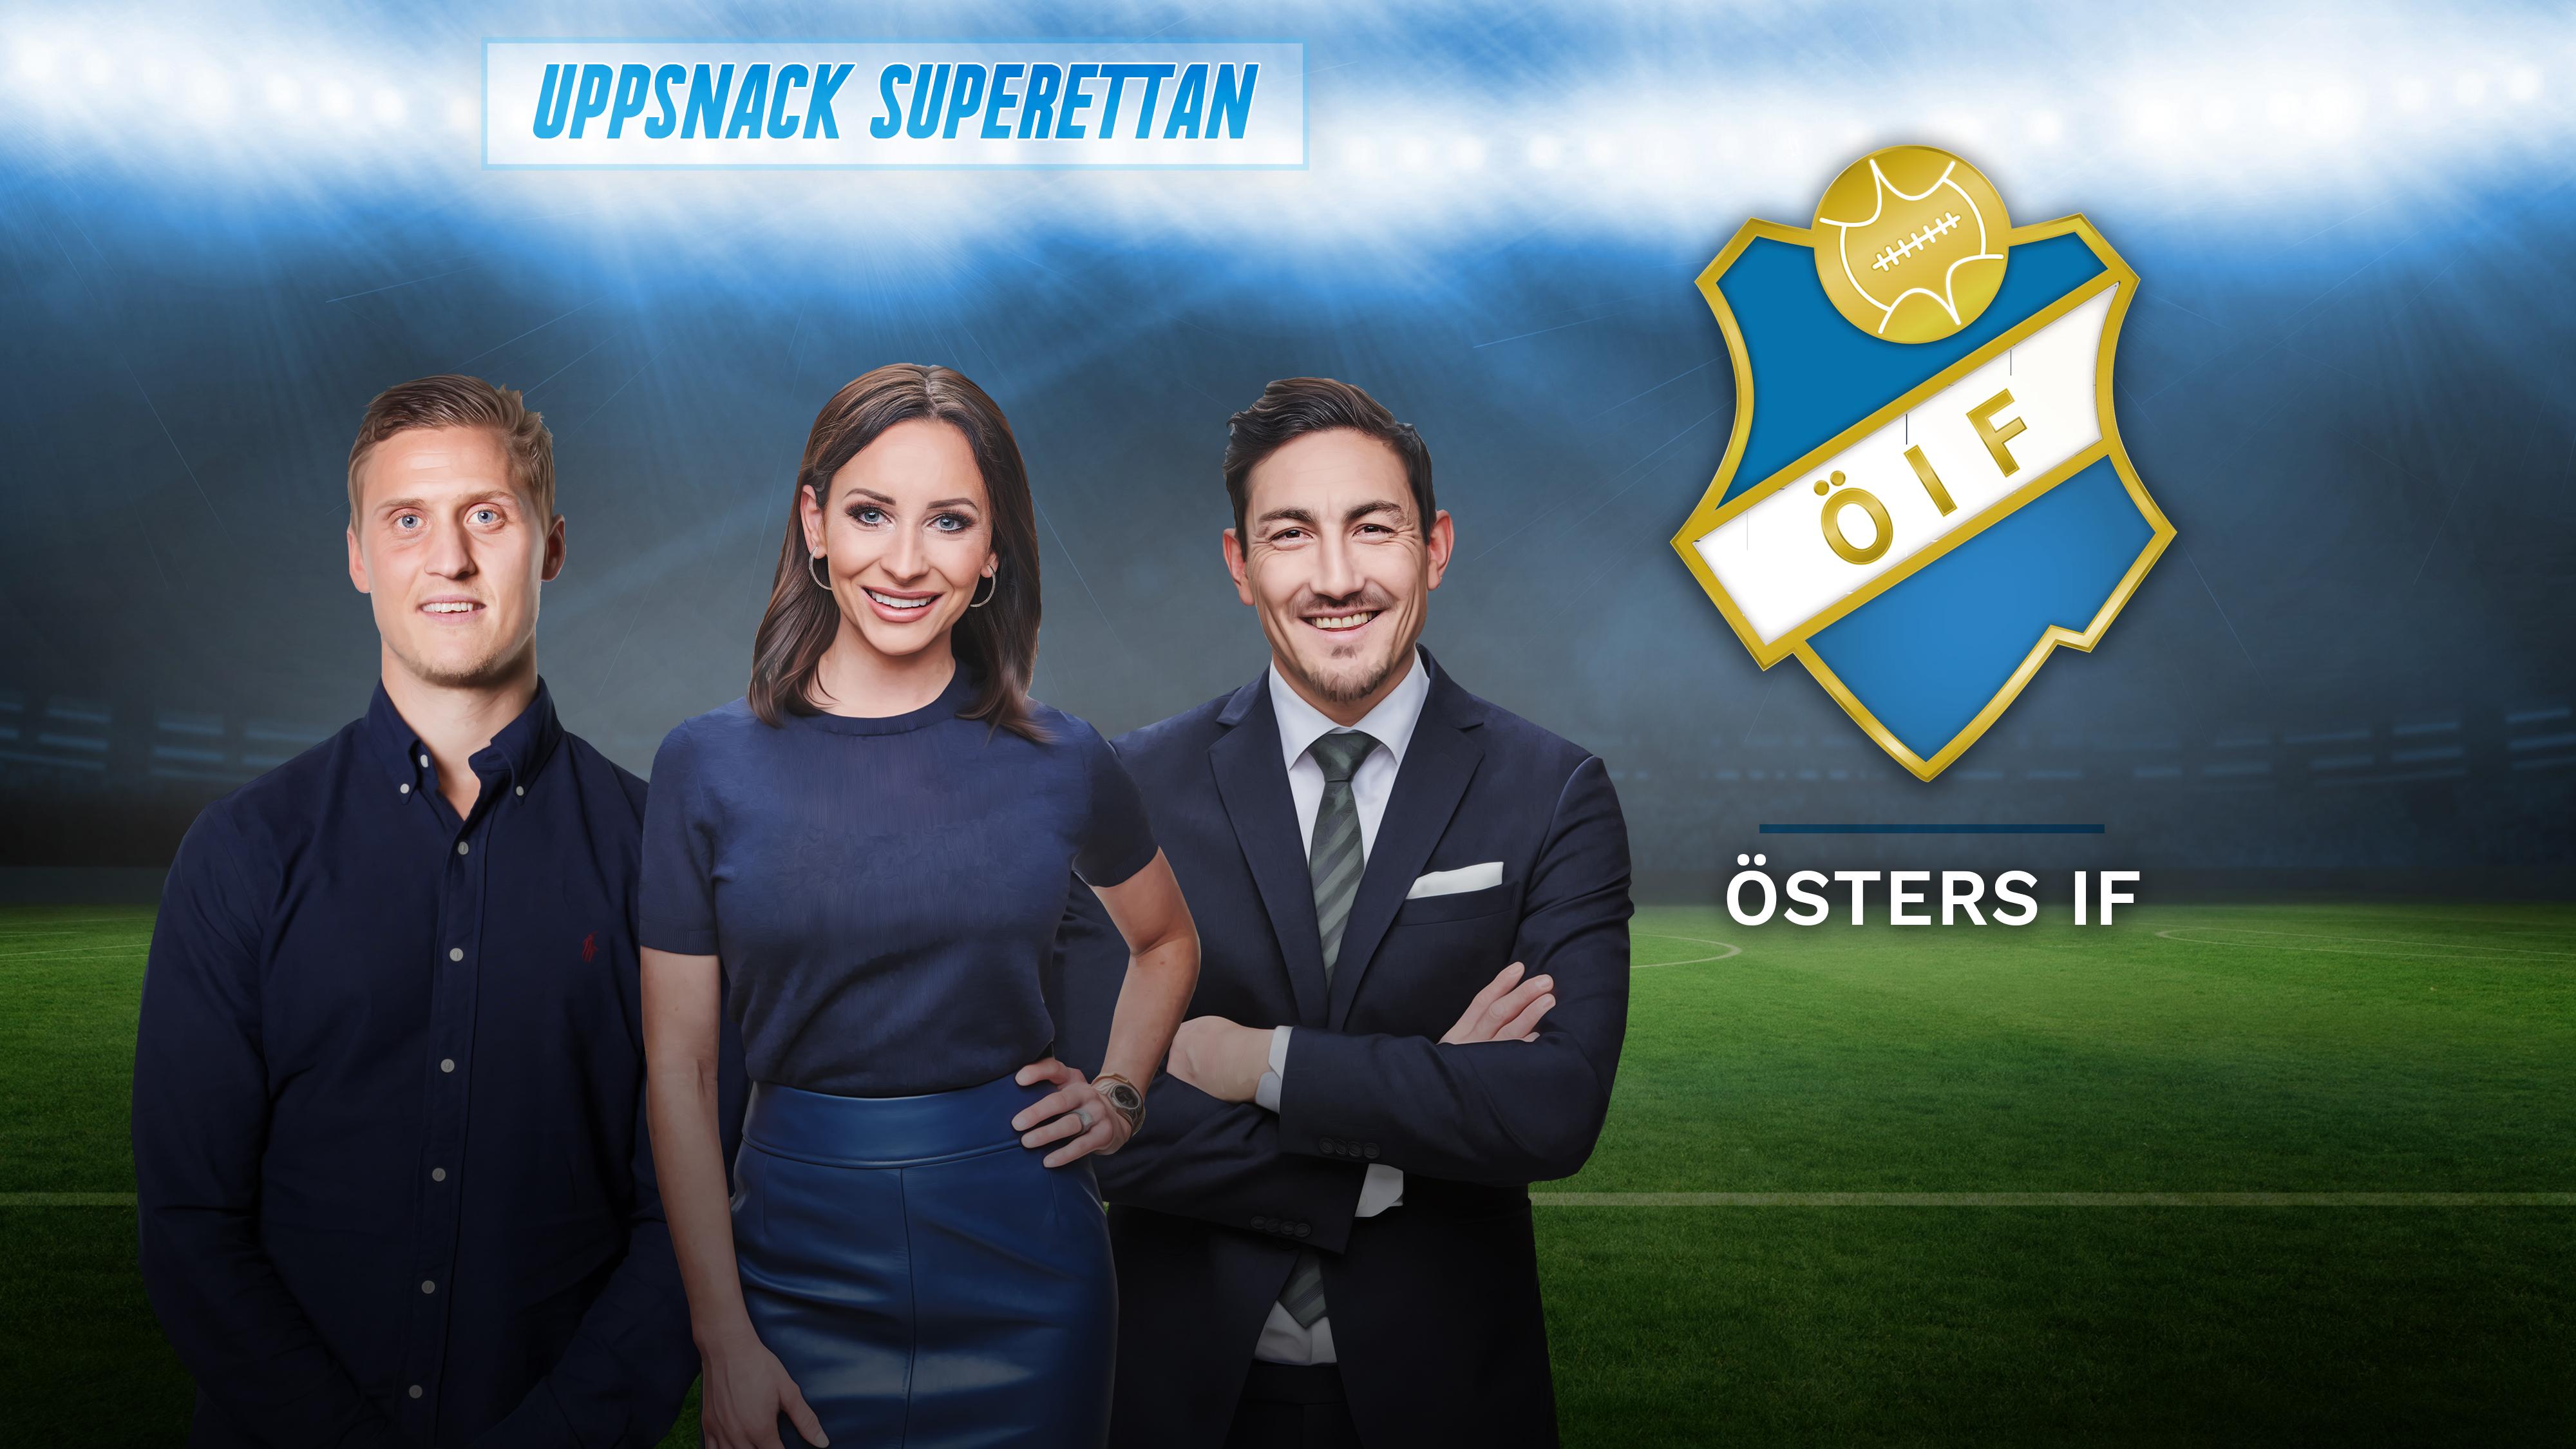 Uppsnack Superettan Dplay